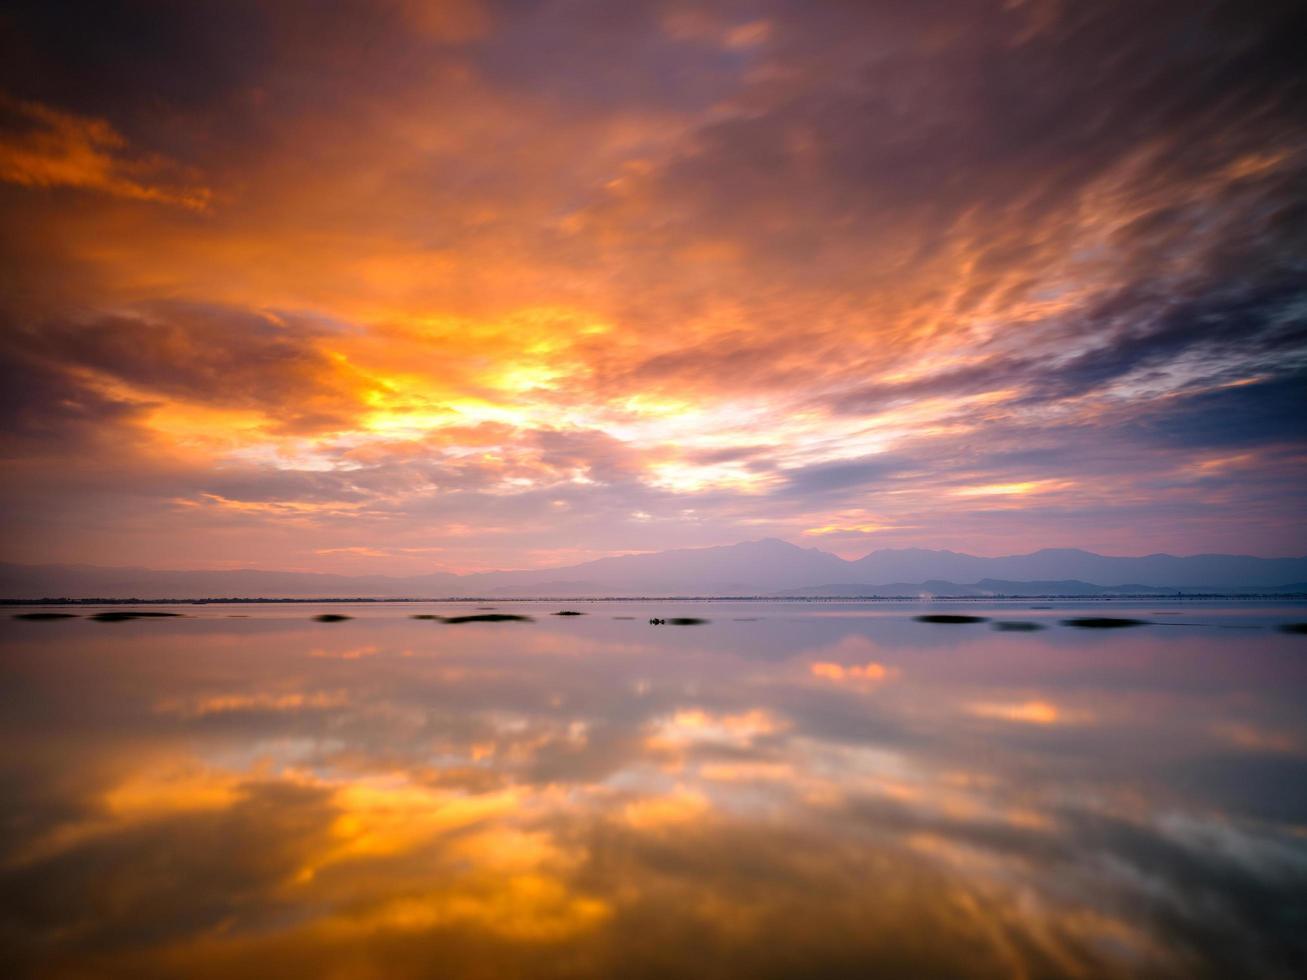 zonsondergang weerspiegelt in stilstaand water foto